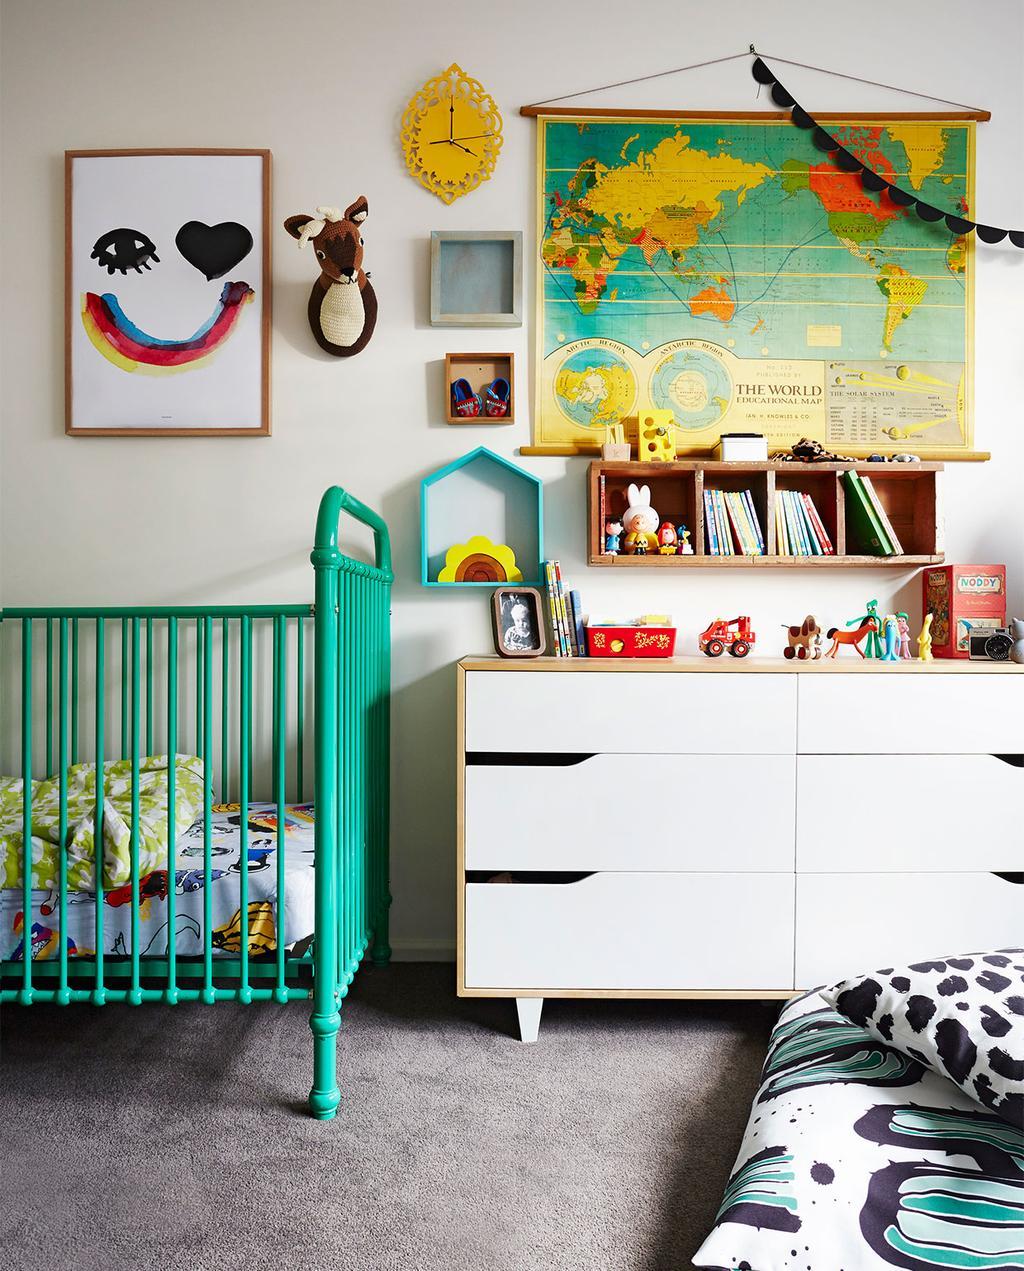 vtwonen binnenkijken special 07-2021 | kinderkamer met groene wieg en witte commode